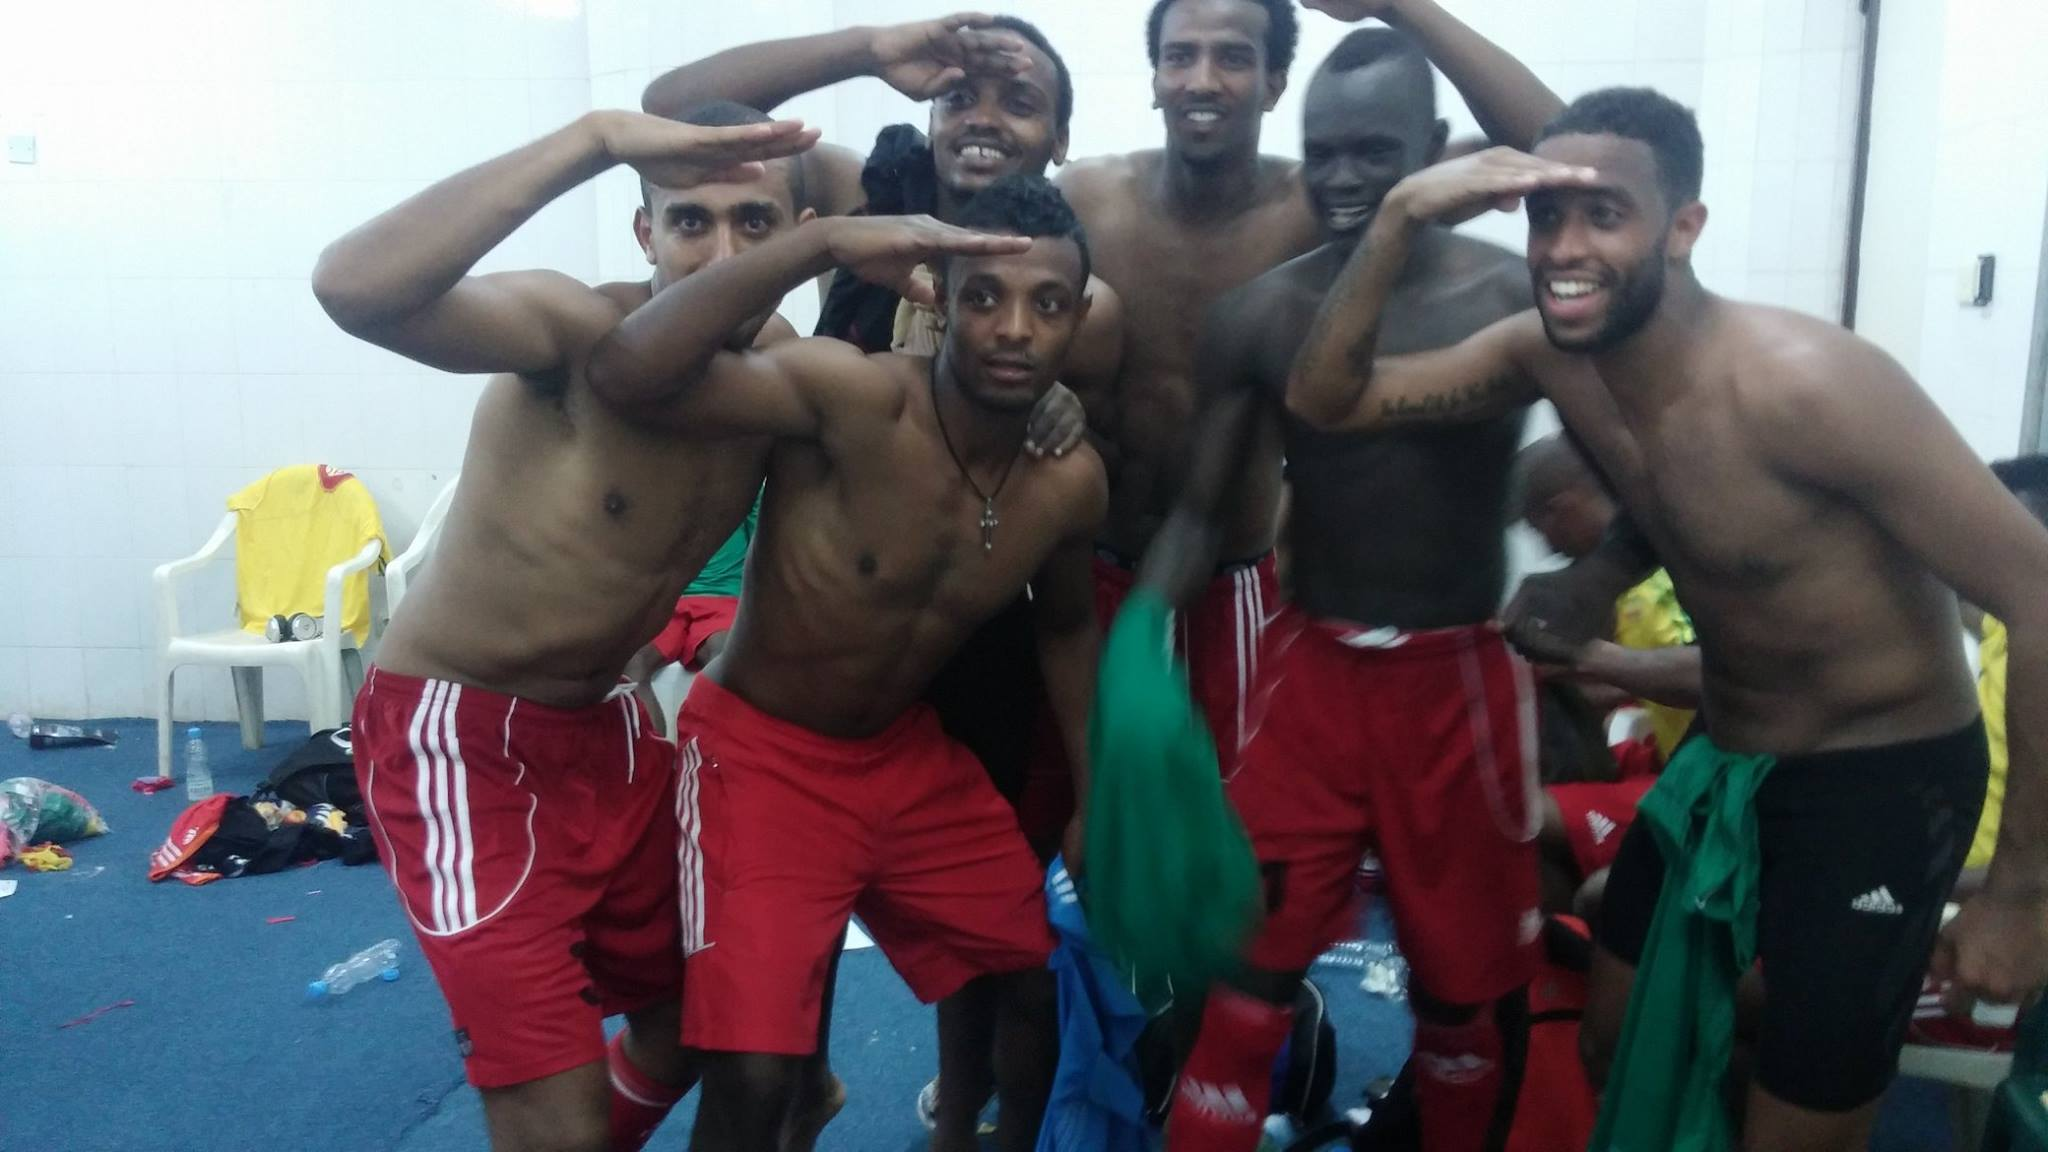 Mali fans attack Ethiopian team bus in Mali